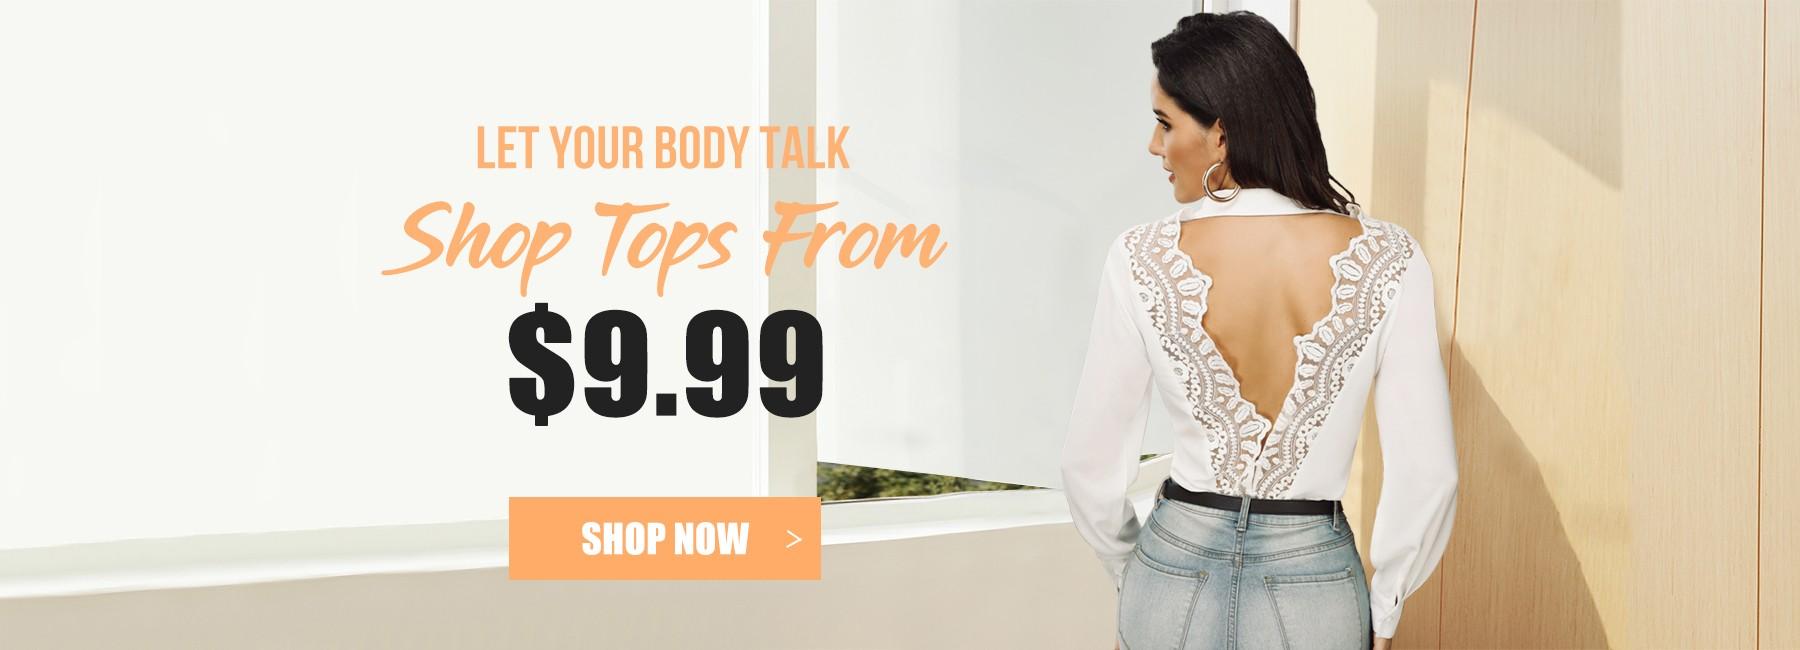 992fc02ff2 Boutiquefeel: Women's Fashion Online Shopping